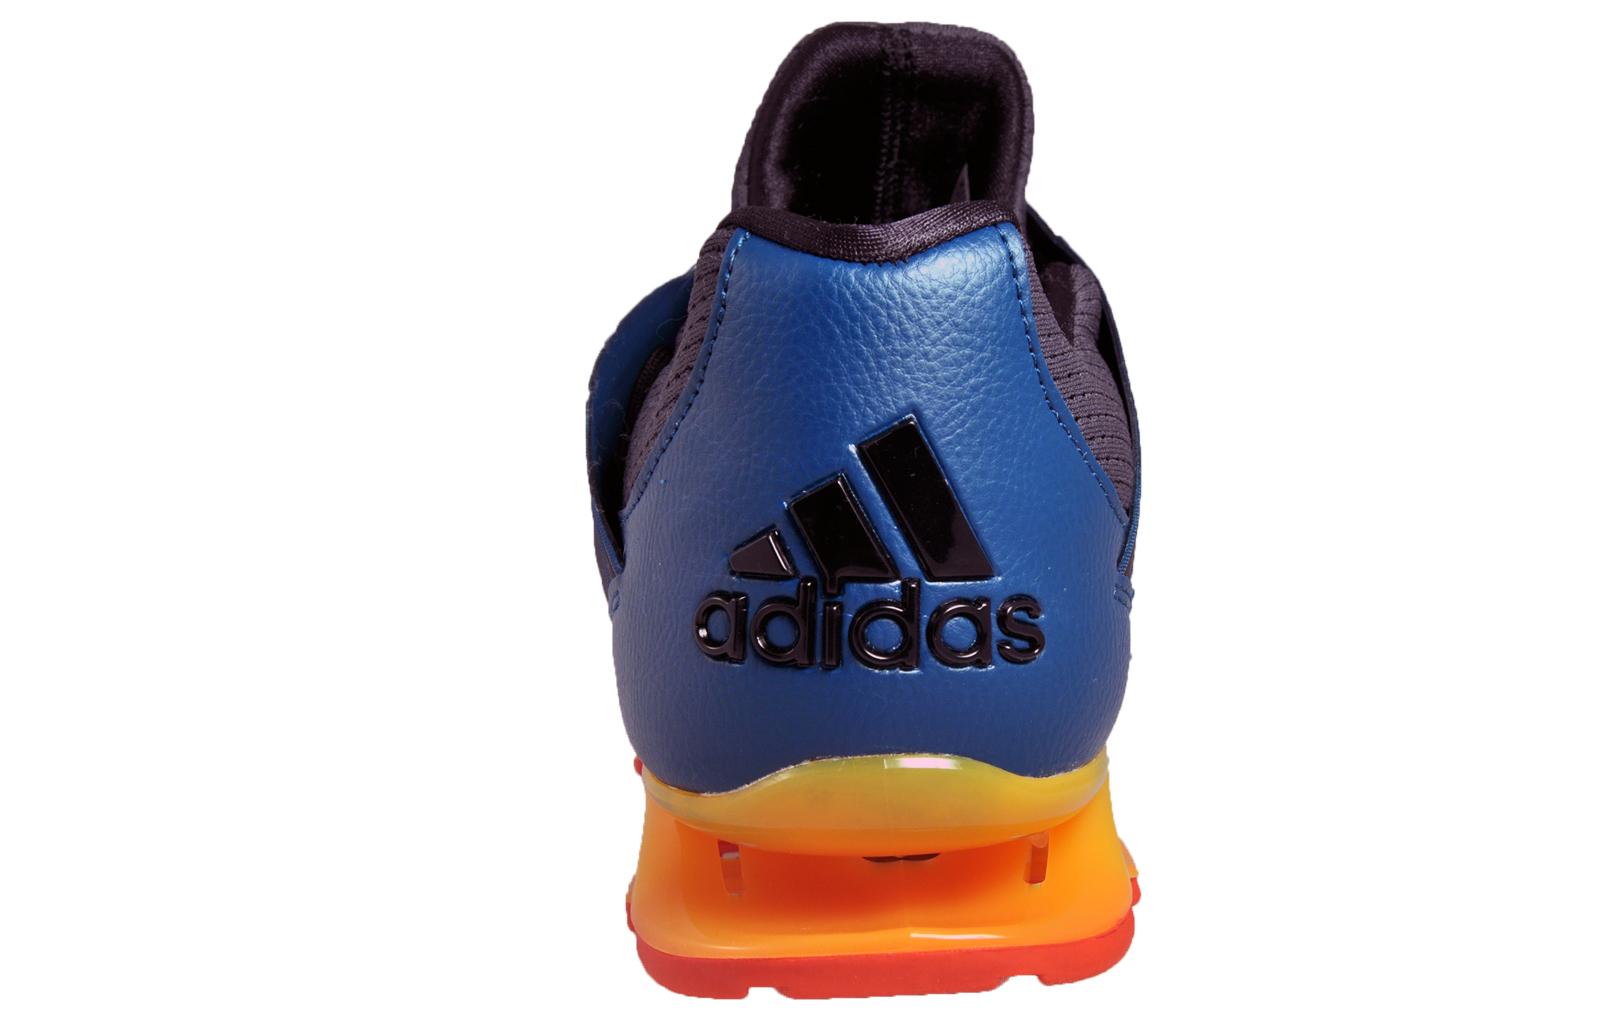 adidas springblade solyce herren - laufschuhe fitness - trainer